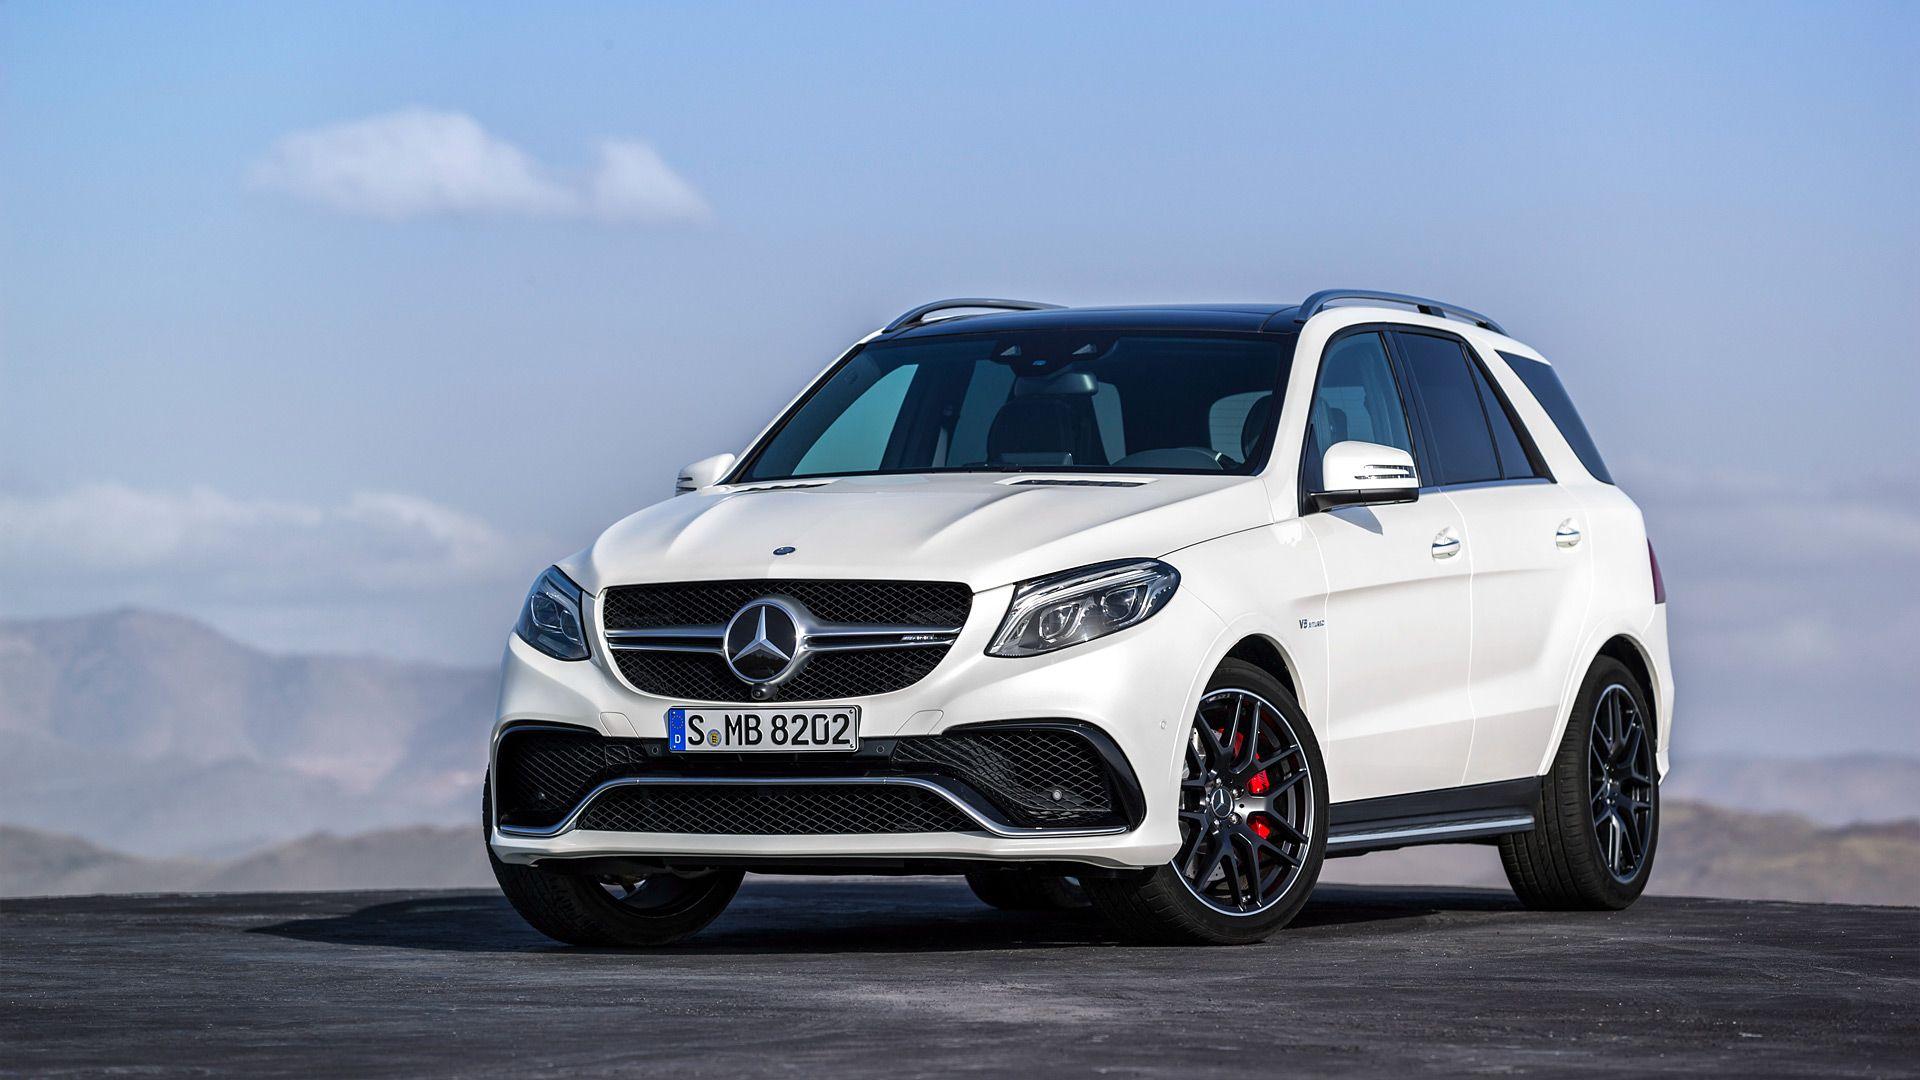 2016 Mercedes Benz Gle 63 Amg Http Www Wsupercars Com Merc 2016